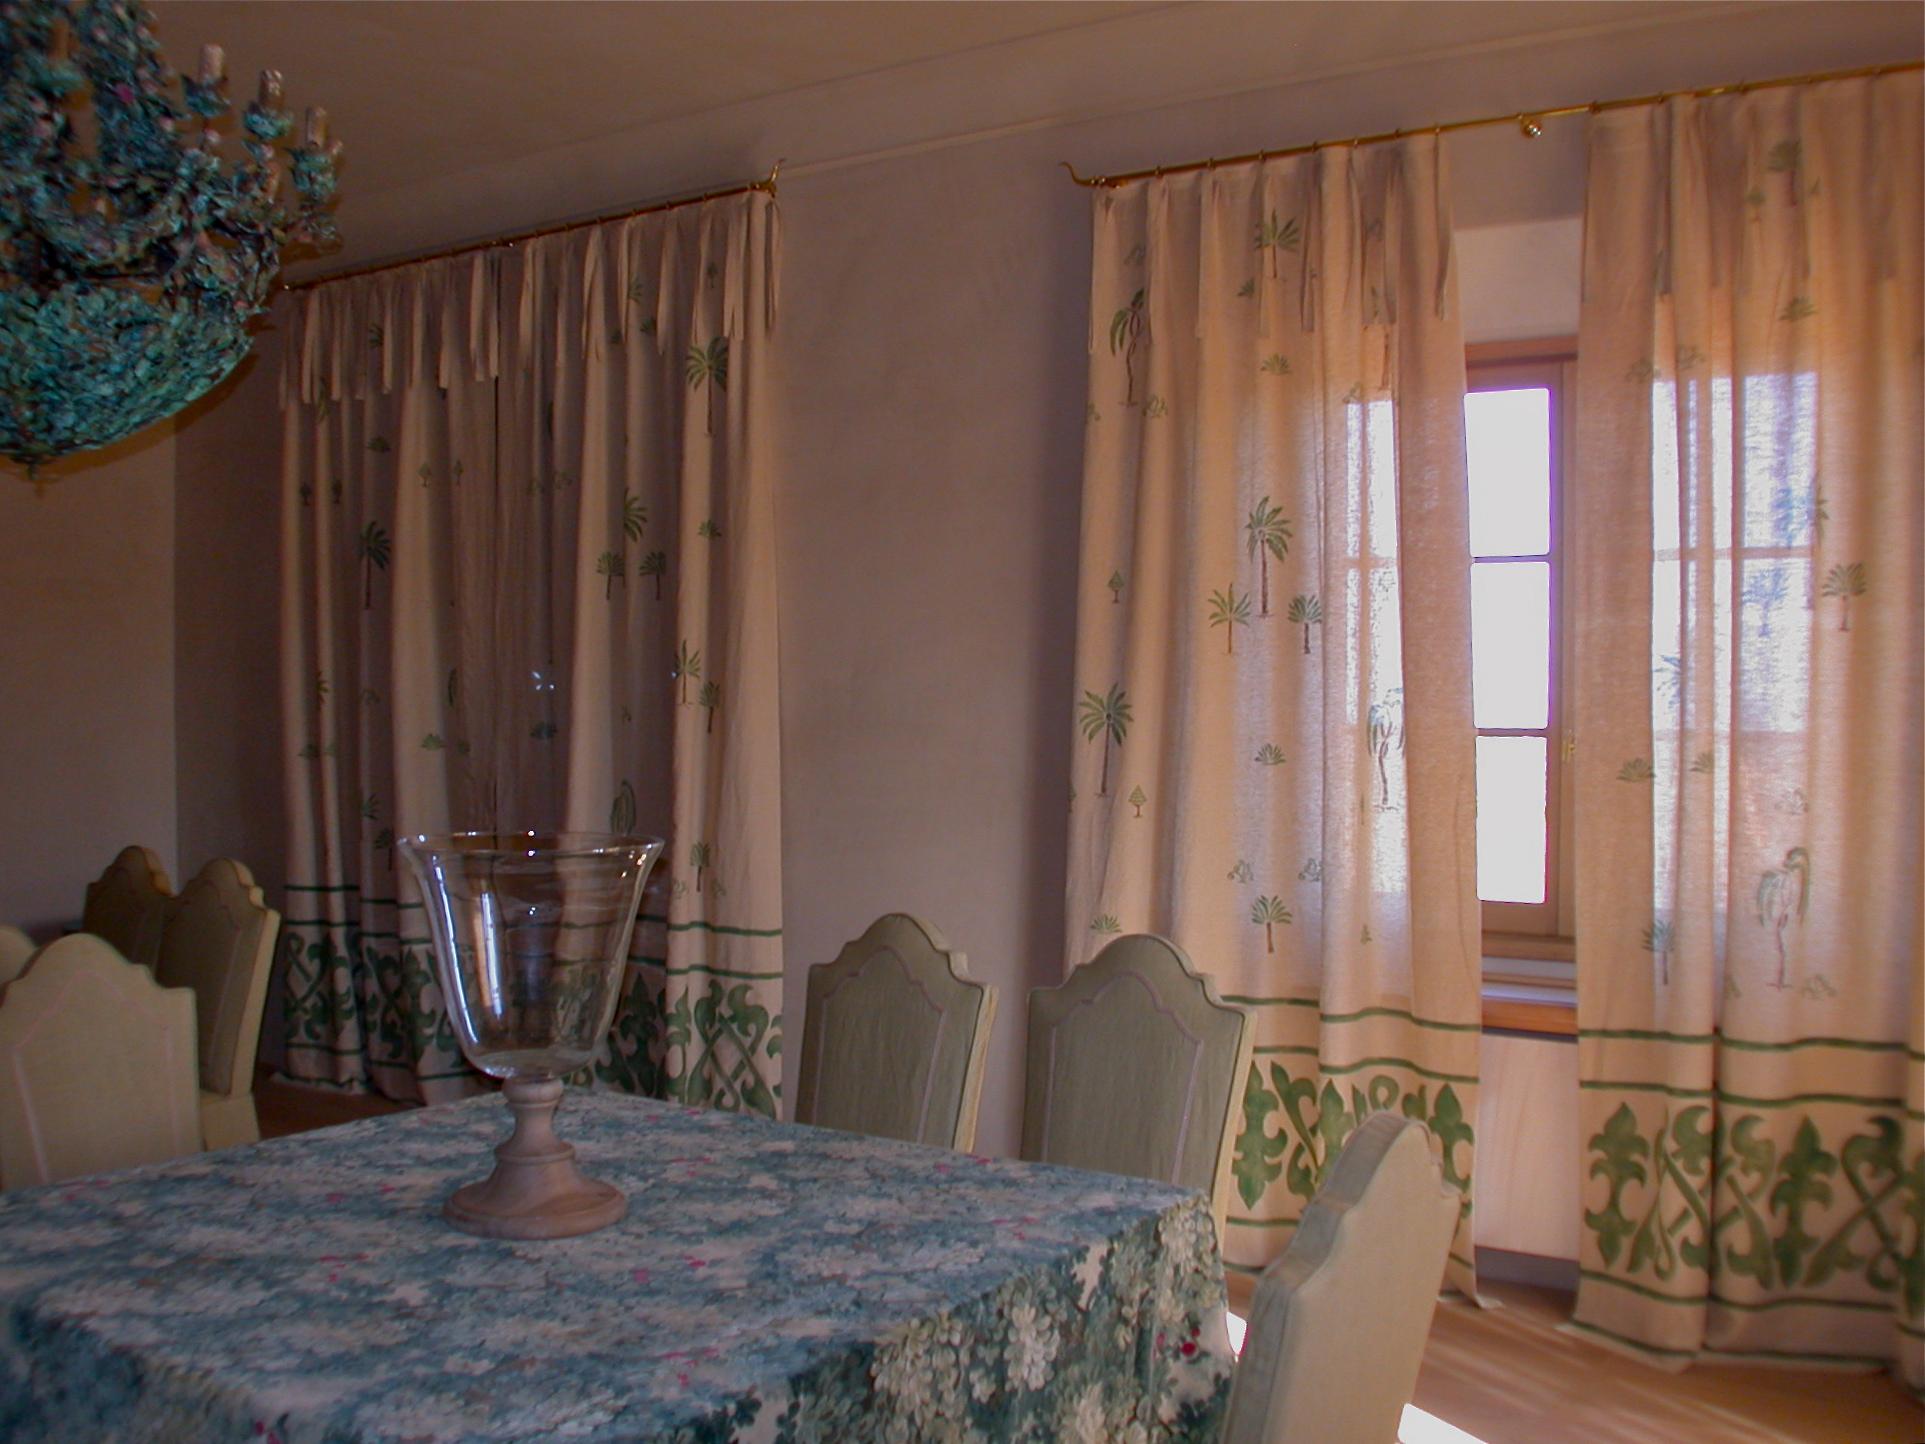 Tende Sala Da Pranzo Decorazione Pittorica Di Interni Bologna  #805E49 1925 1444 Sala Da Pranzo Blu